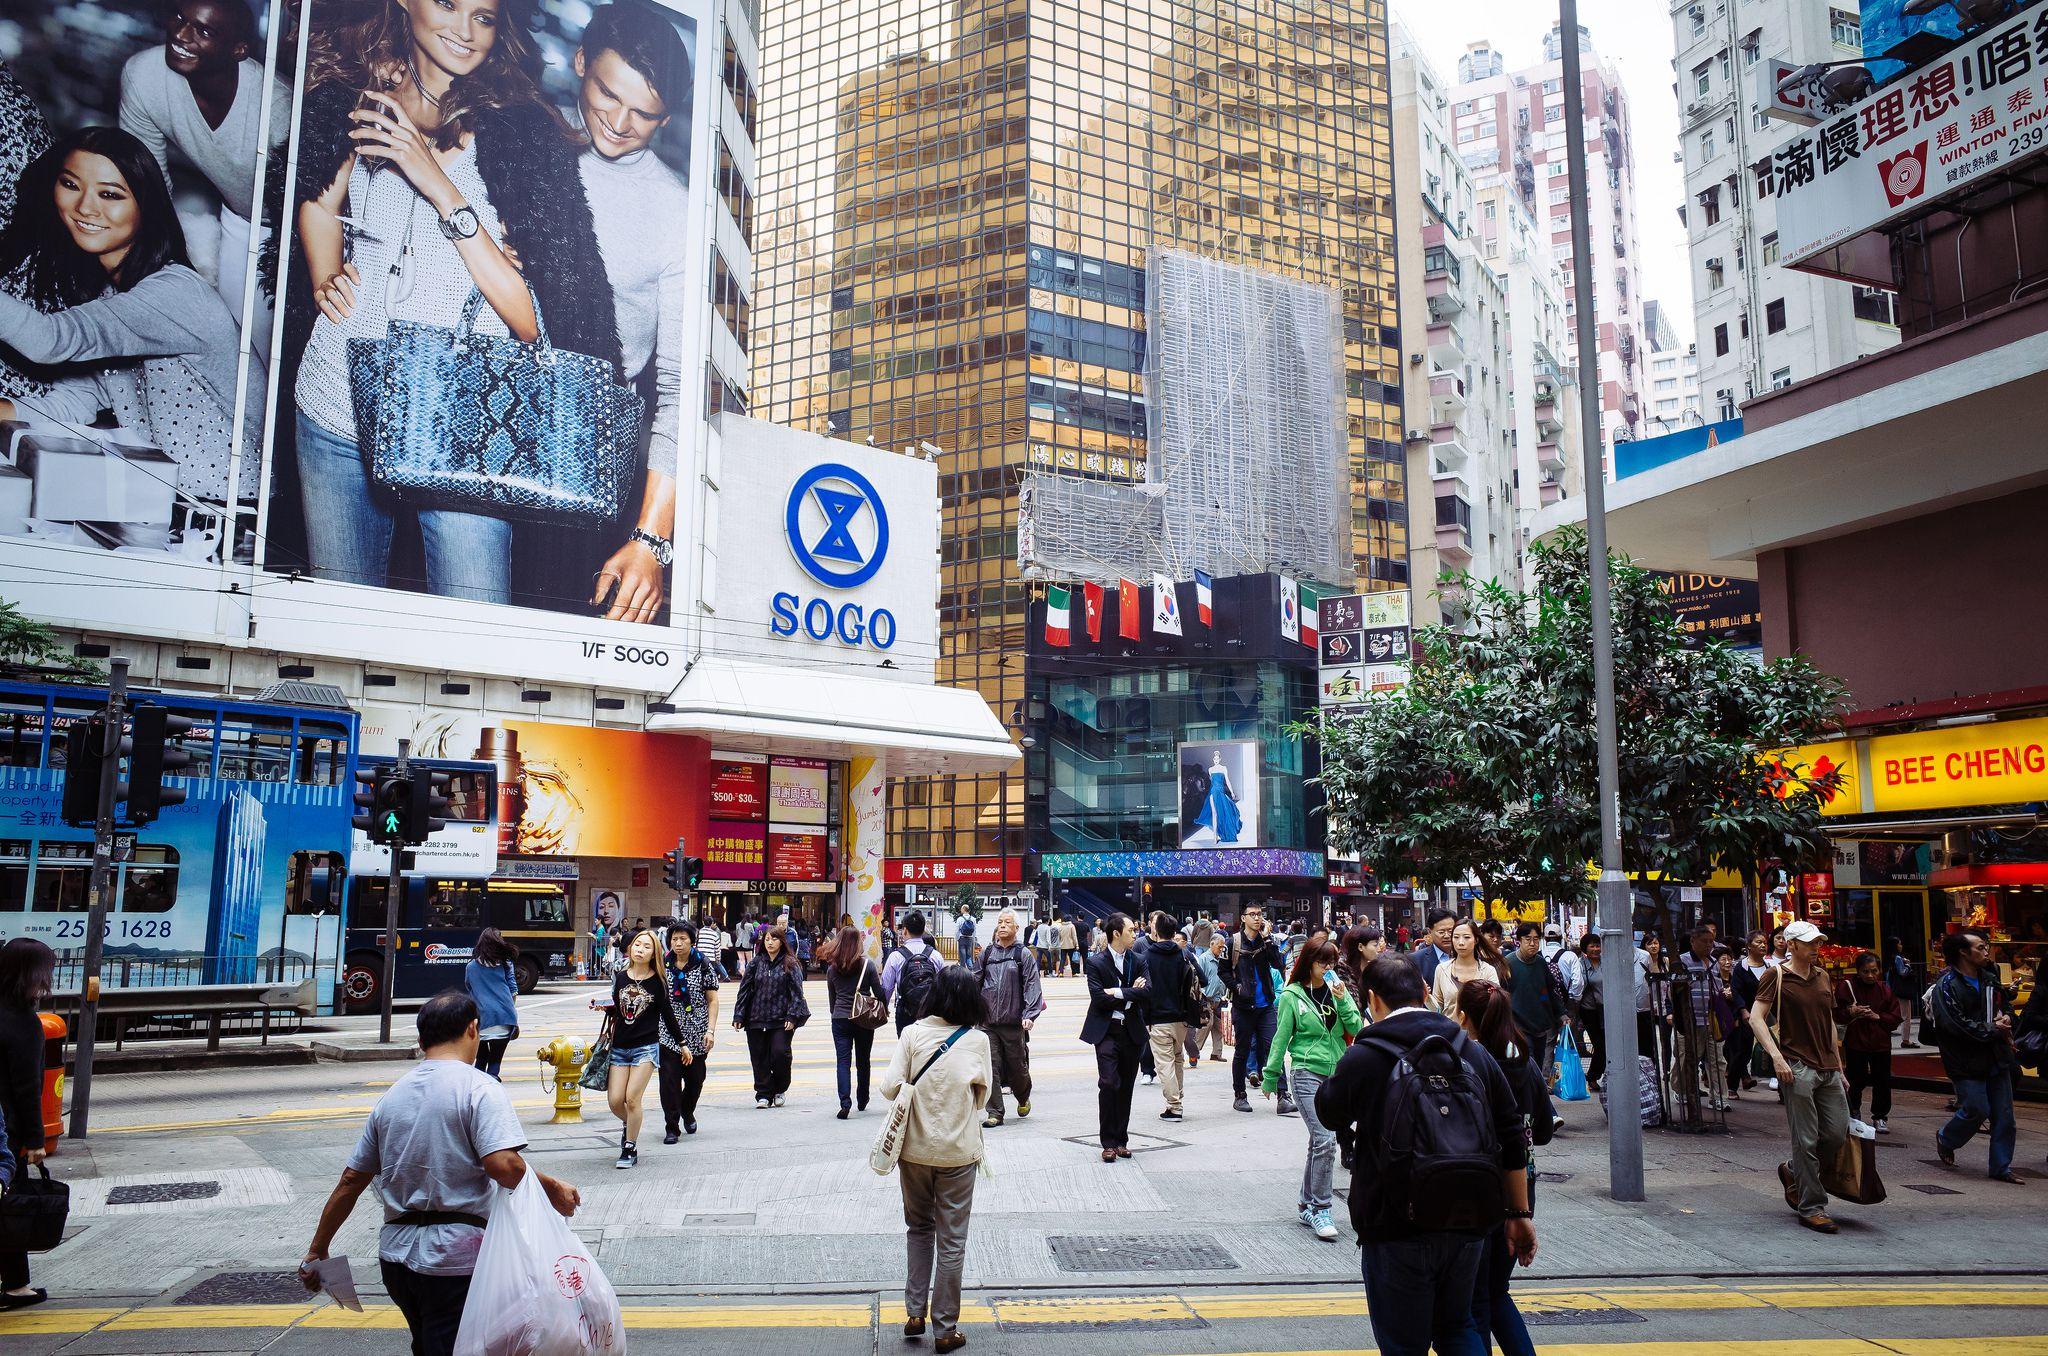 Sogo department store in Hong Kong.